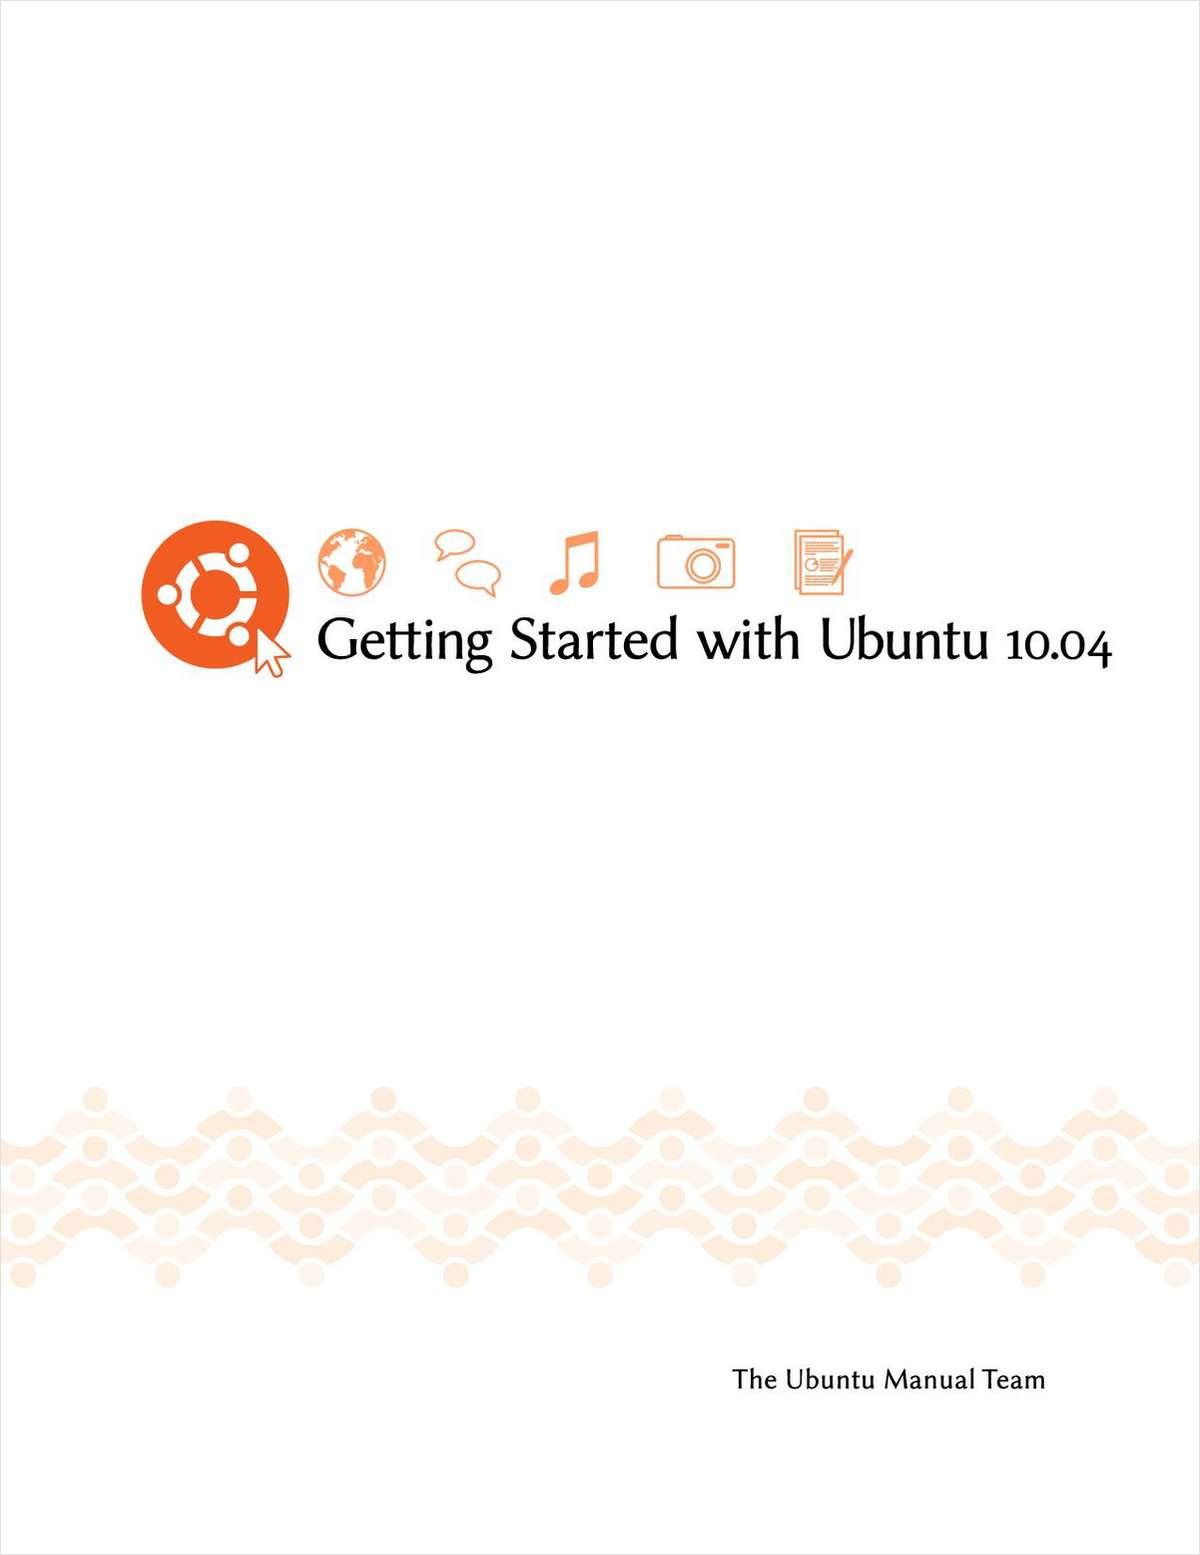 A Complete Beginner's Manual for Ubuntu 10.04 (Lucid Lynx)